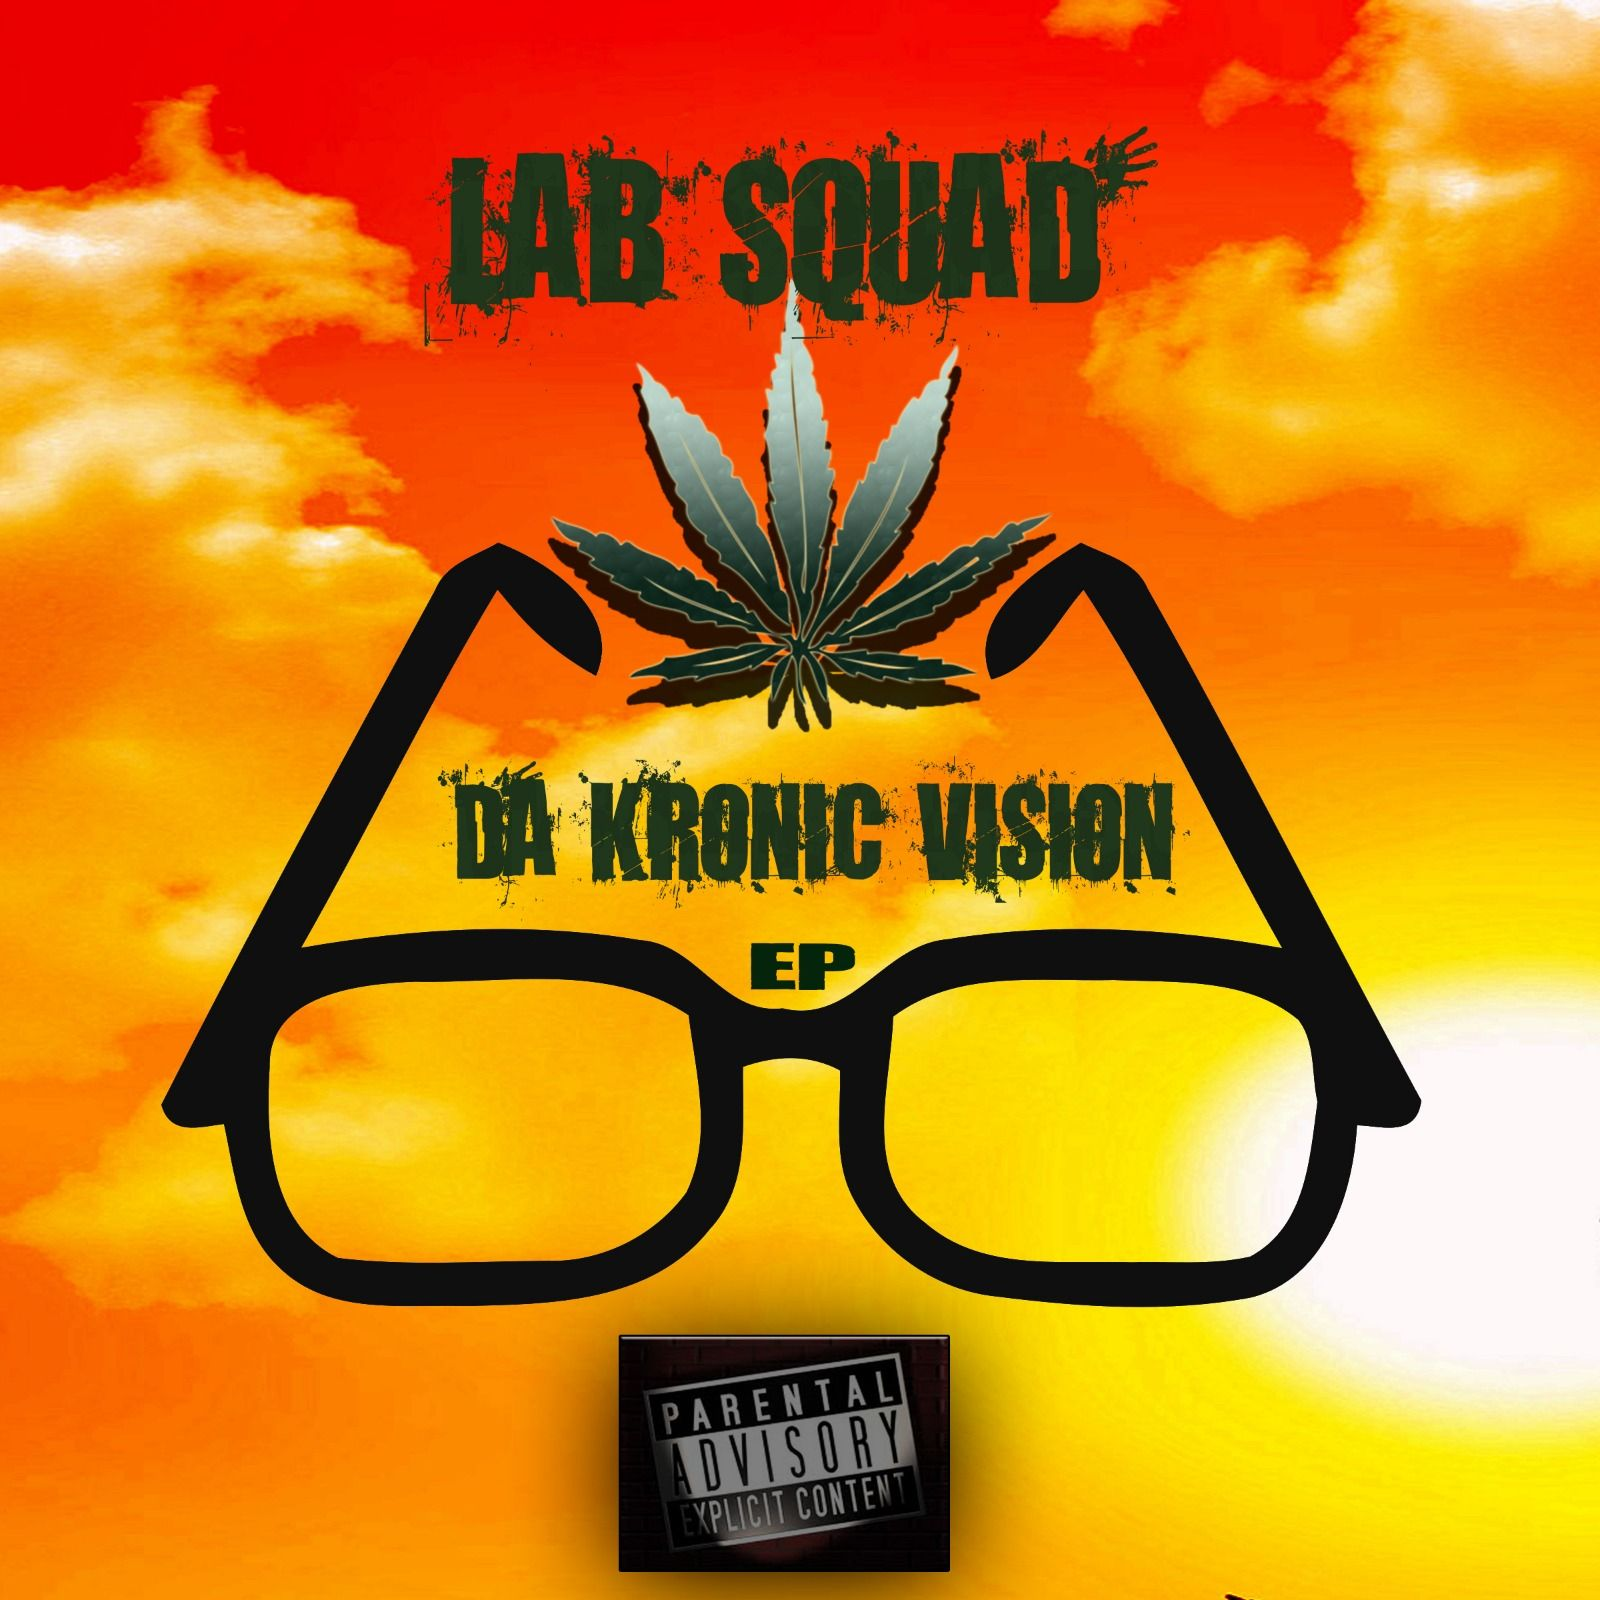 Da Kronic Vision EP by LAB SQUAD (Blakzuba & Kro-N-I), from